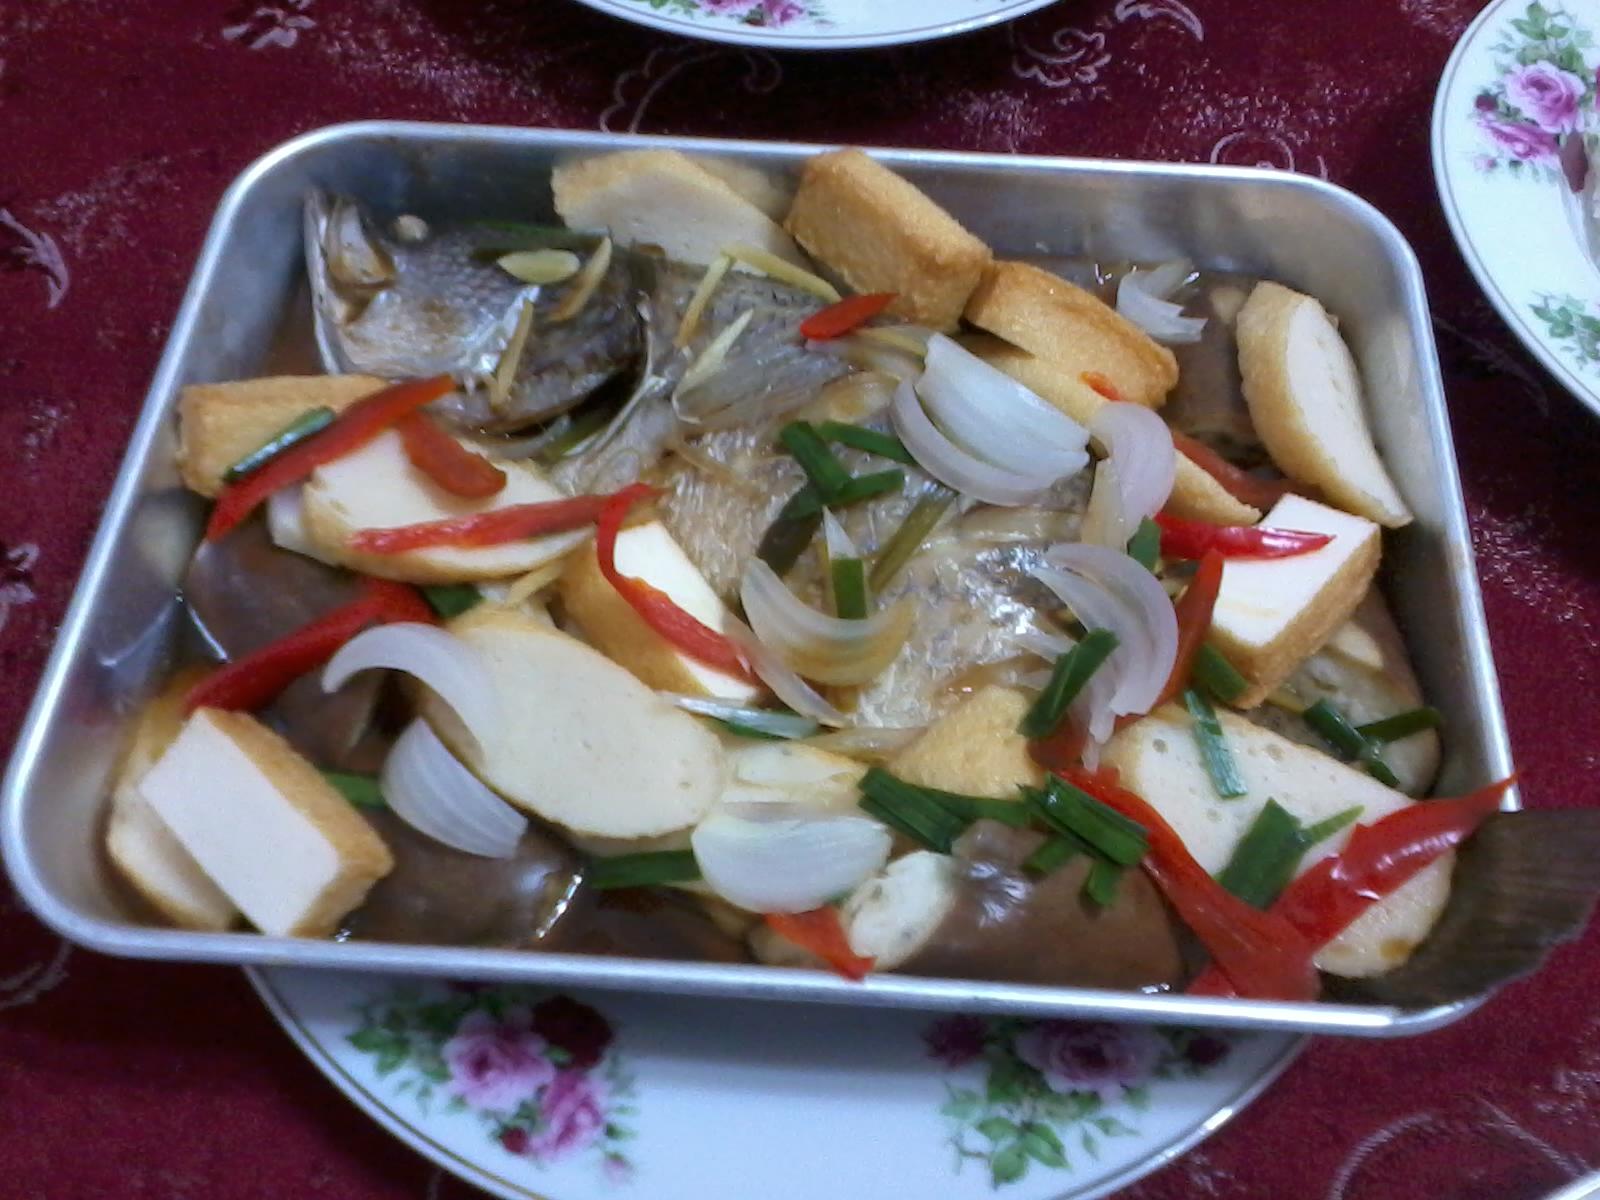 resepi ikan gerut masak asam pedas resep masakan khas Resepi Sup Sayur Kelantan Enak dan Mudah